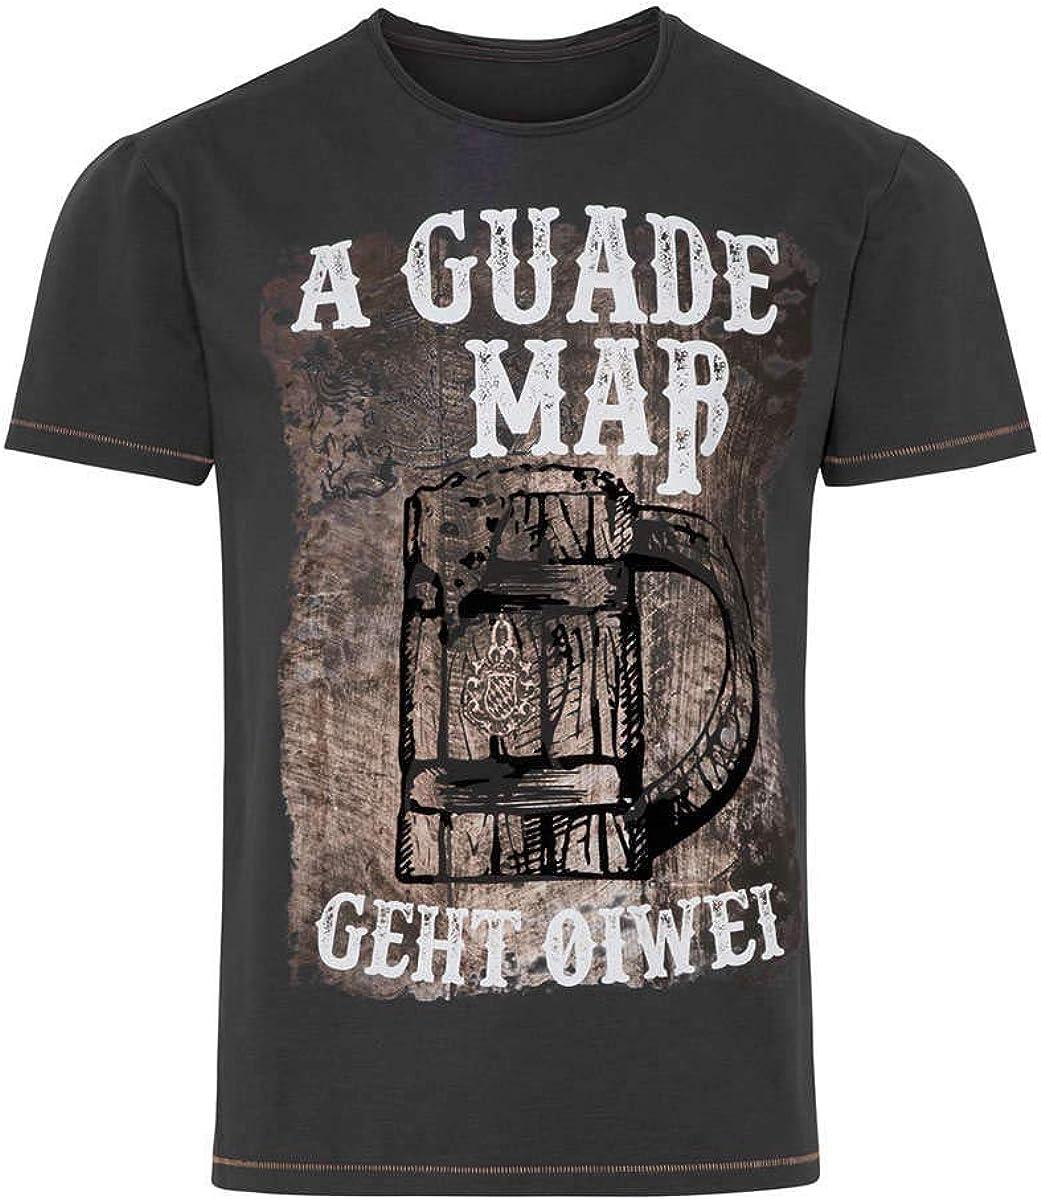 Hangowear Herren Herren T-Shirt A guade Ma/ß geht ollerwei dunkelgrau 0208-DUNKELGRAU,